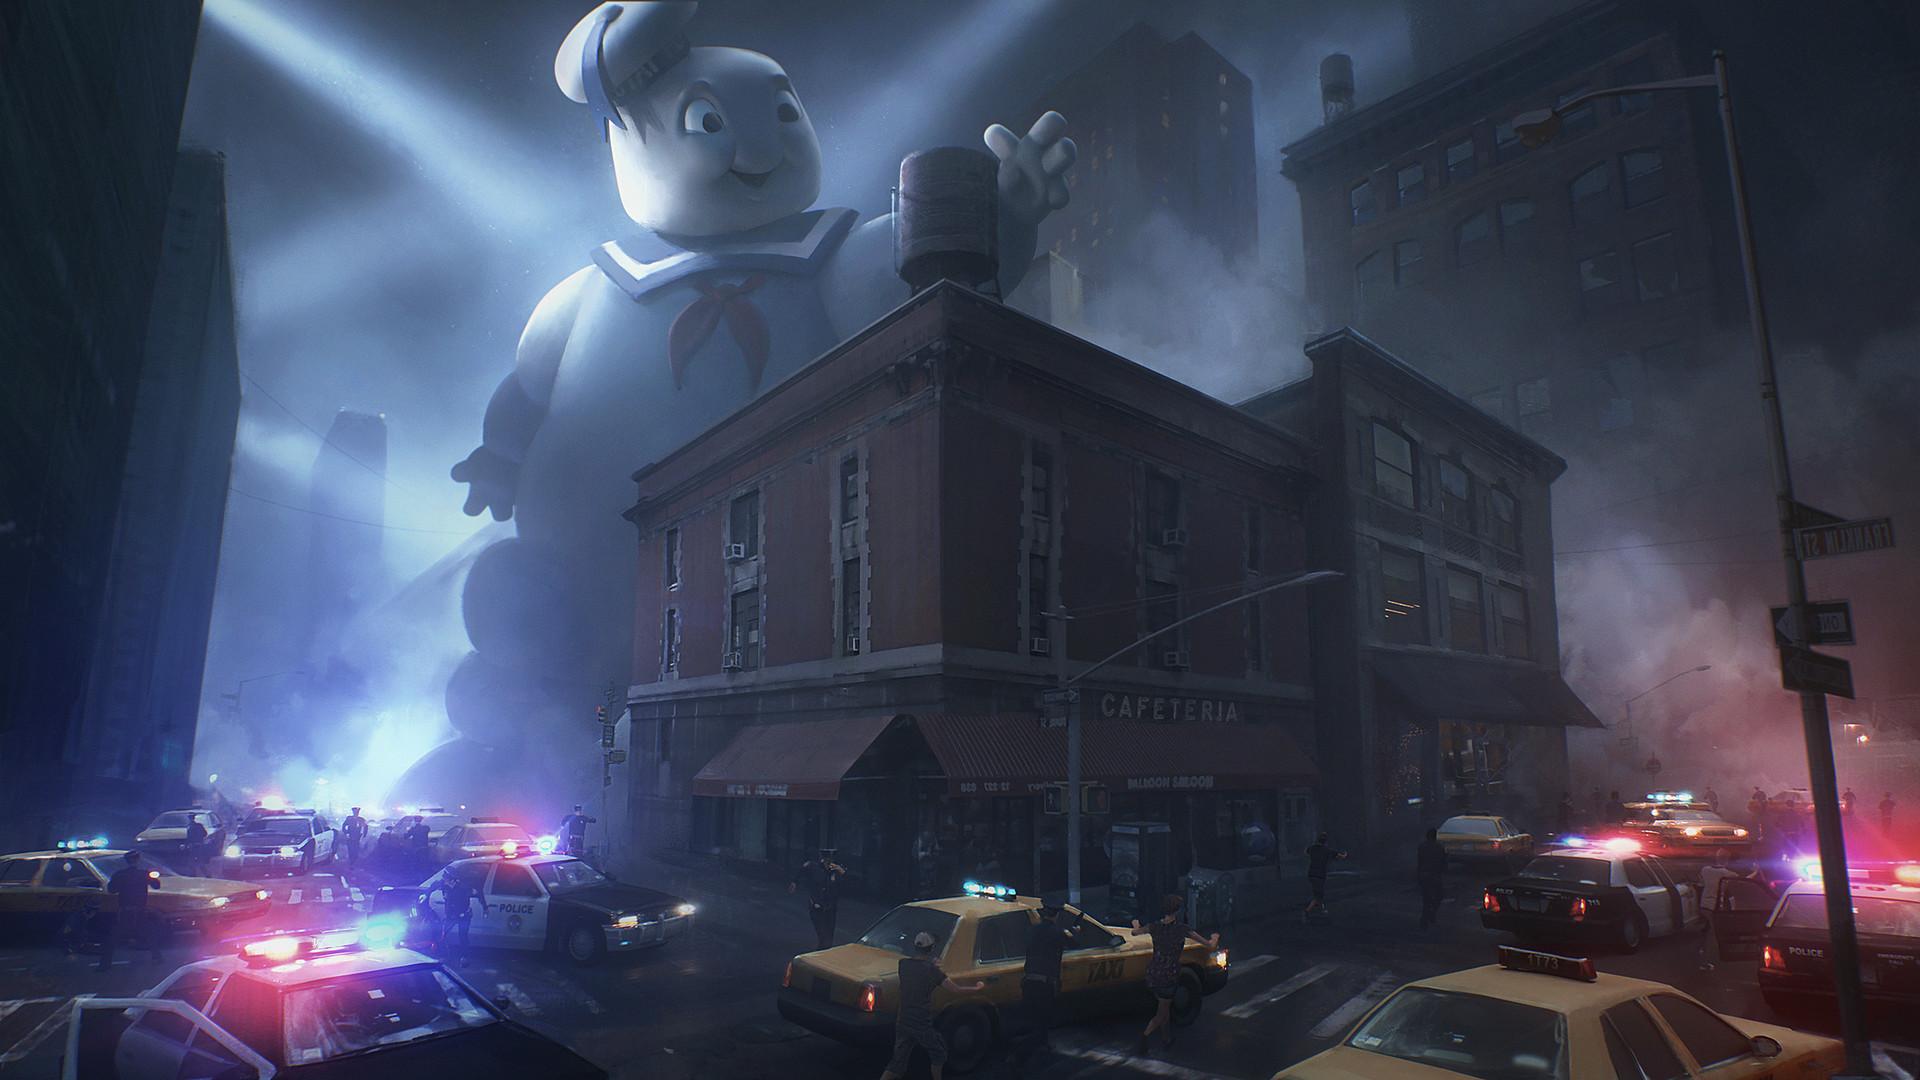 Nikolay Razuev Ghostbusters Fun Art